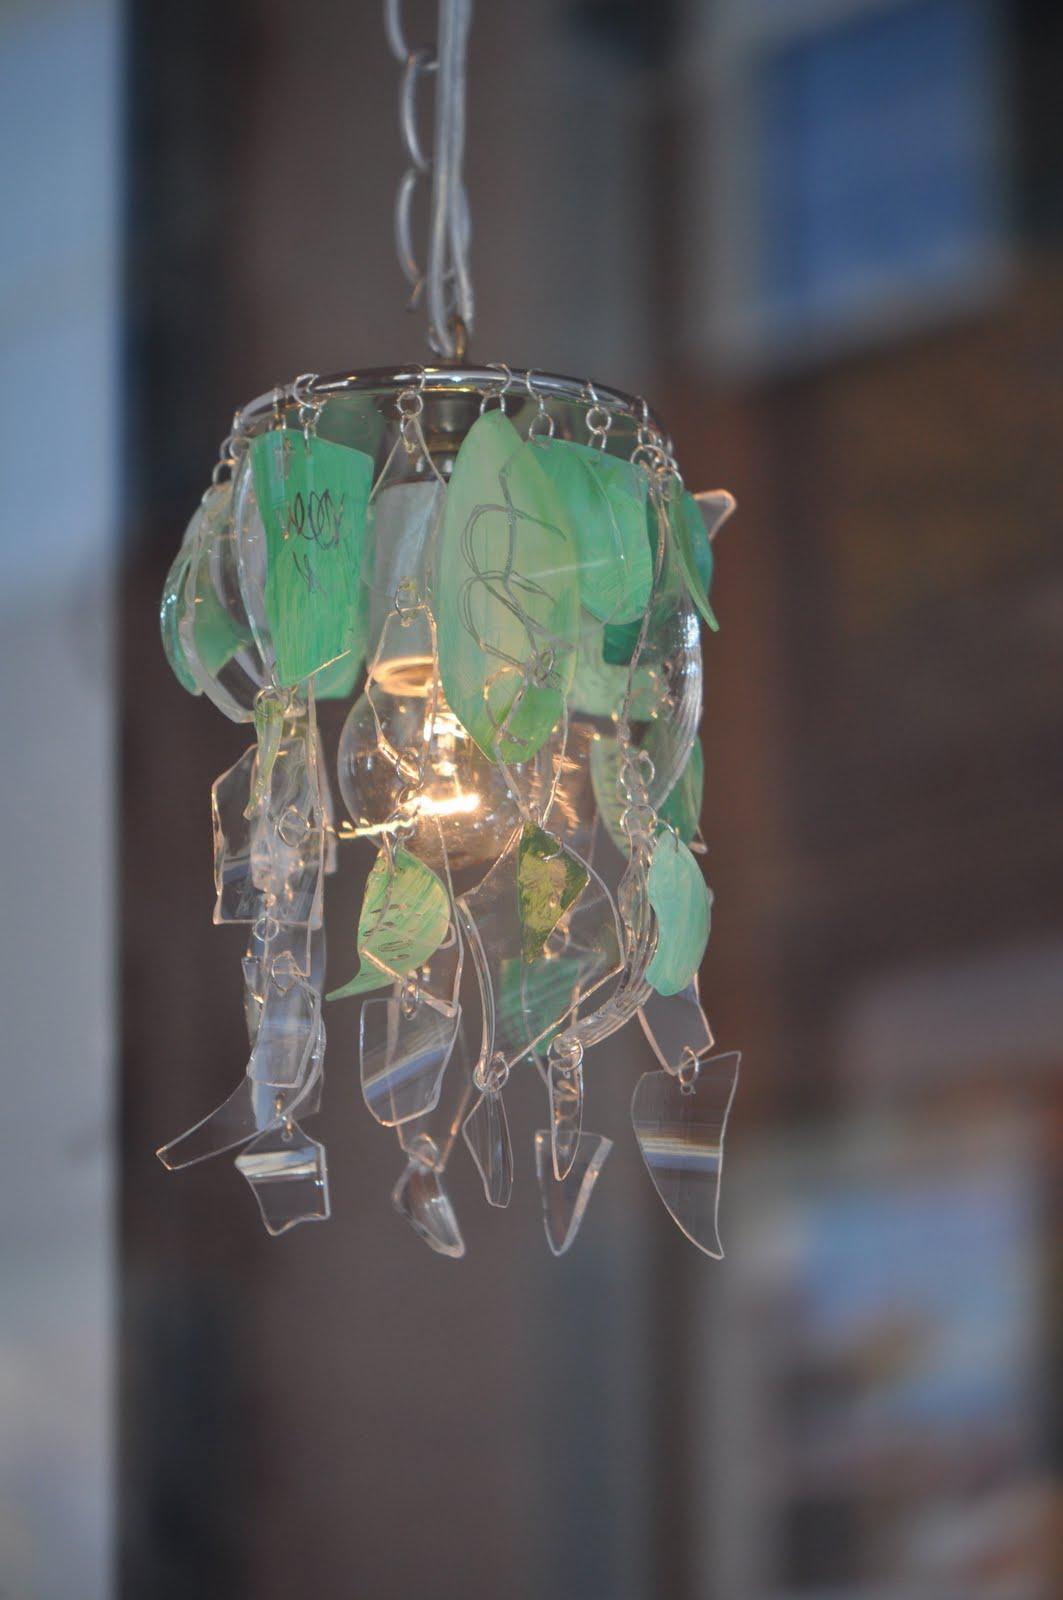 Marlis cornett fallen pendant light made from recycled glass - Recycled glass pendant lights ...